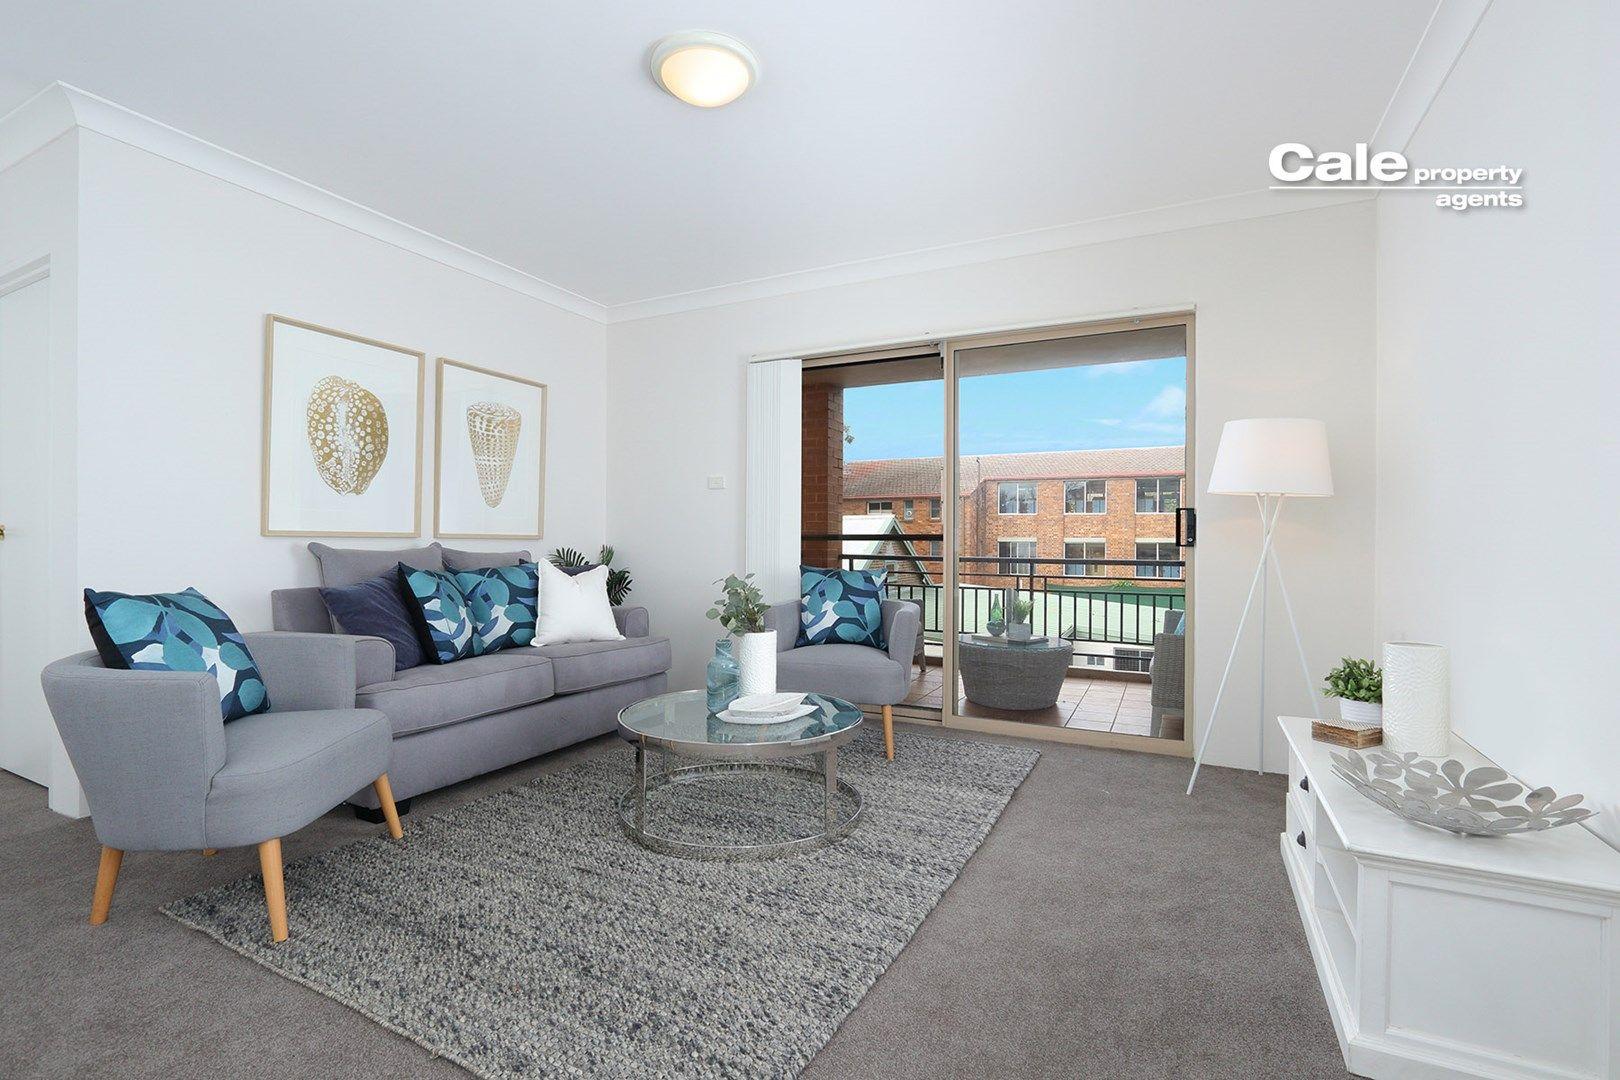 45/52 Oxford Street, Epping NSW 2121, Image 0